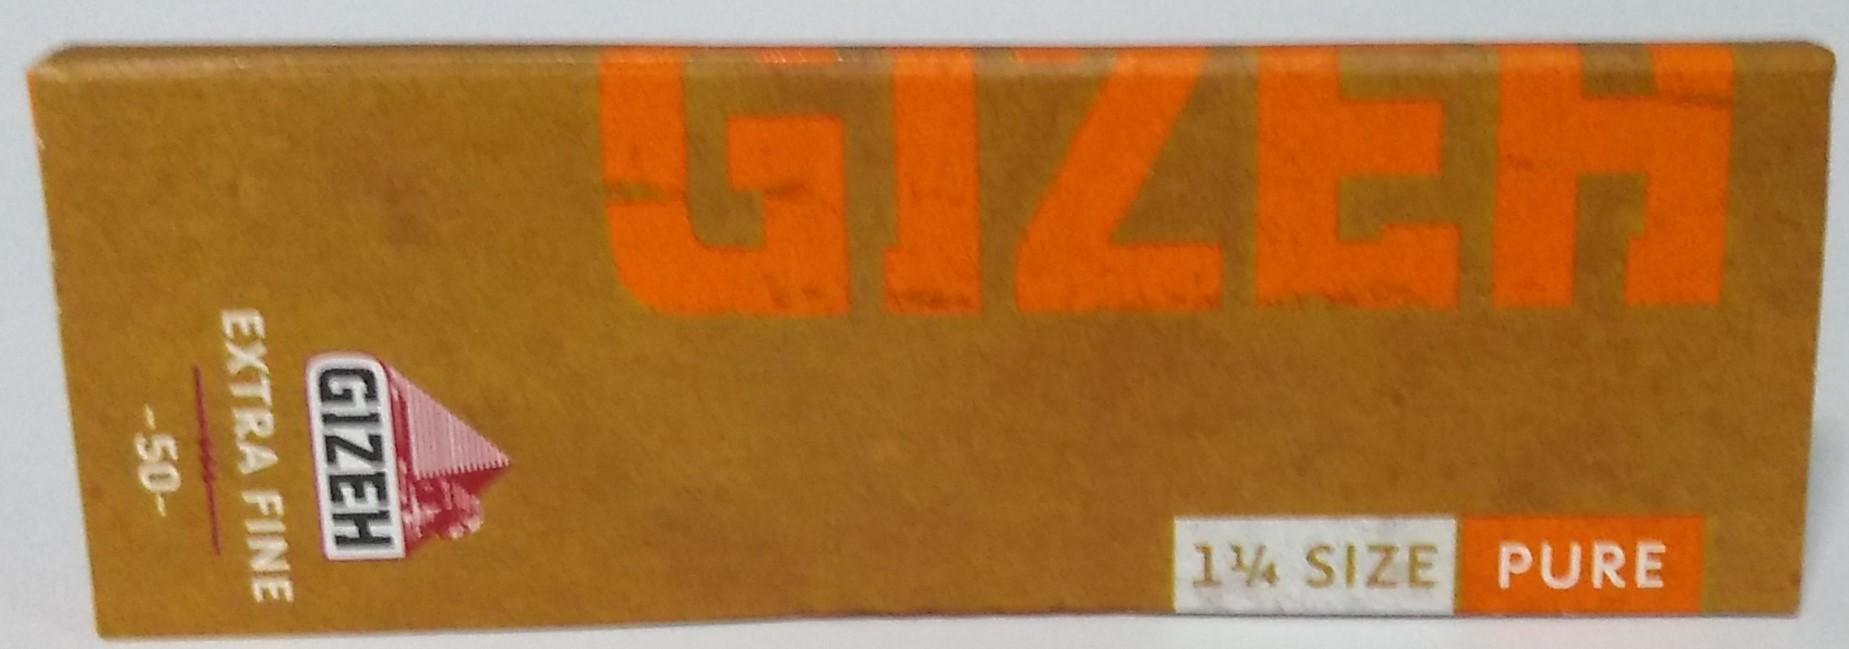 Papel Gizeh Organica  1.1/4 -